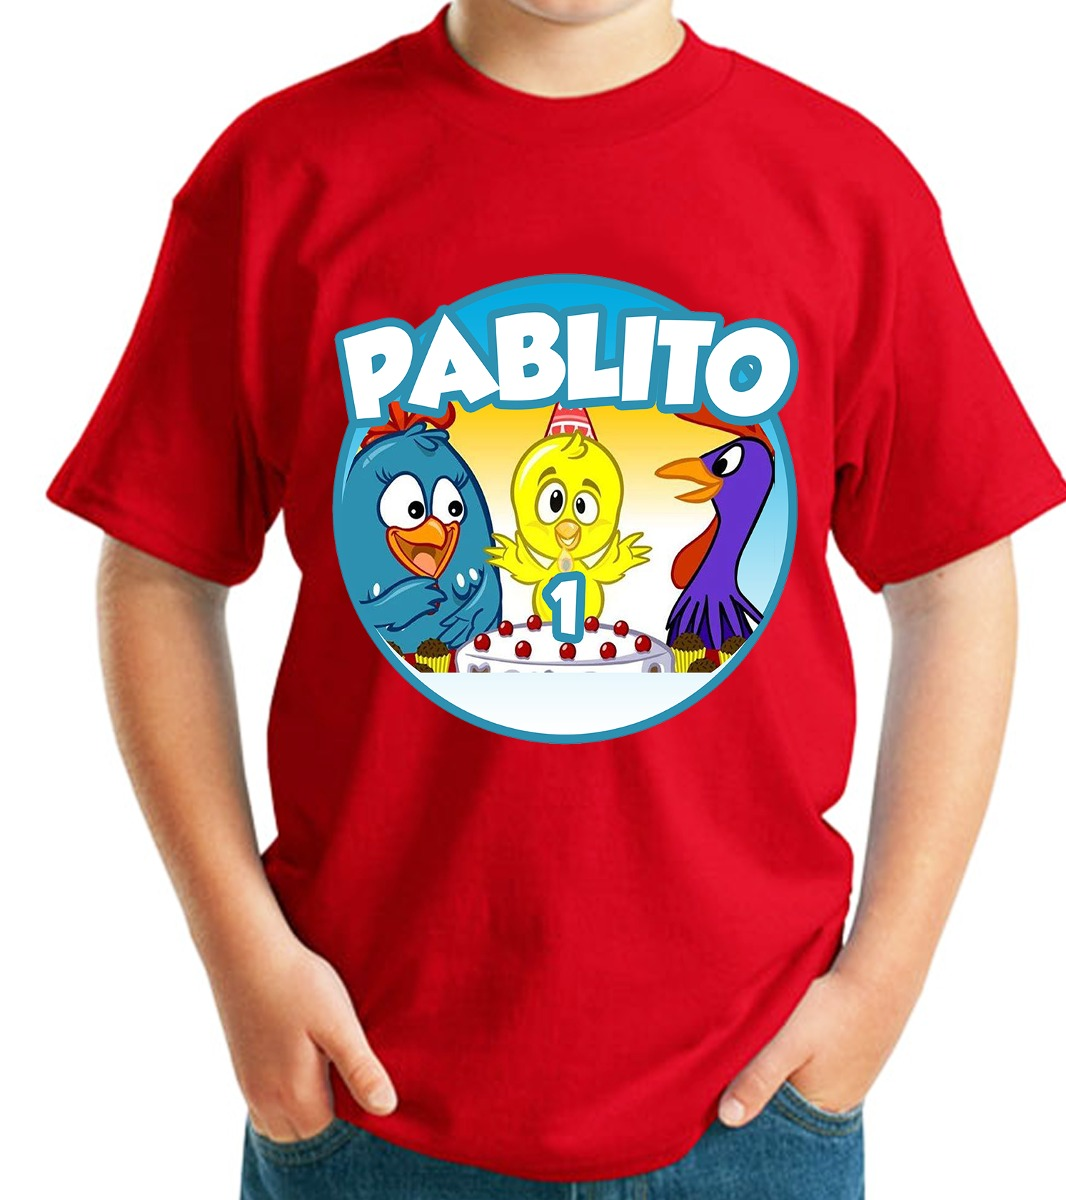 b3f9f0649 Playeras personalizada gallina pintadita fiesta cargando zoom jpg 1066x1200 Camisetas  personalizadas para fiestas